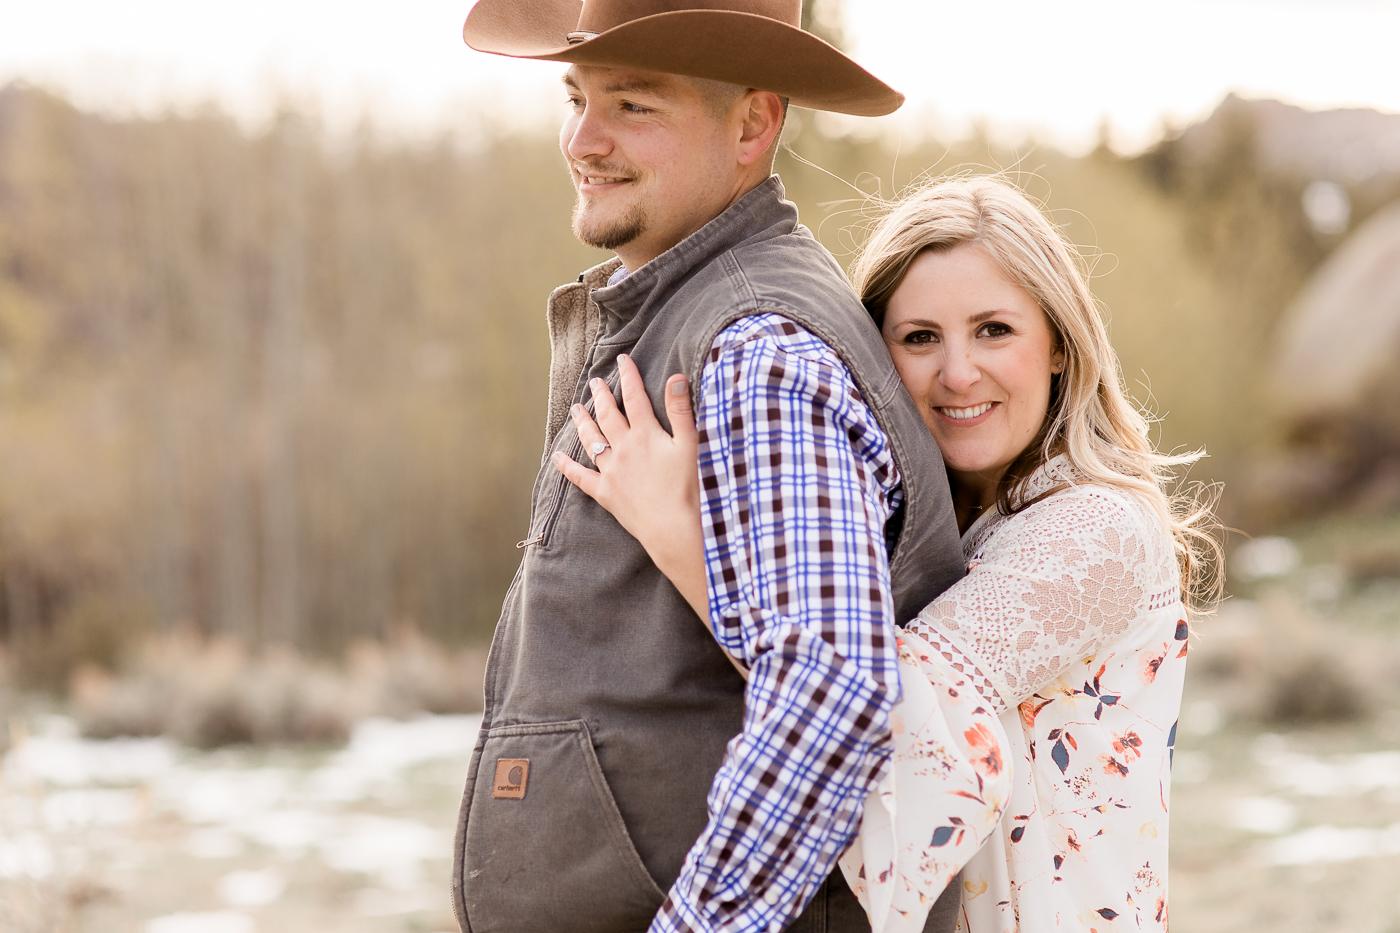 Vedauwoo Medicine Bow National Forest Engagement Photography by Laramie based wedding photographer, Megan Lee Photography.